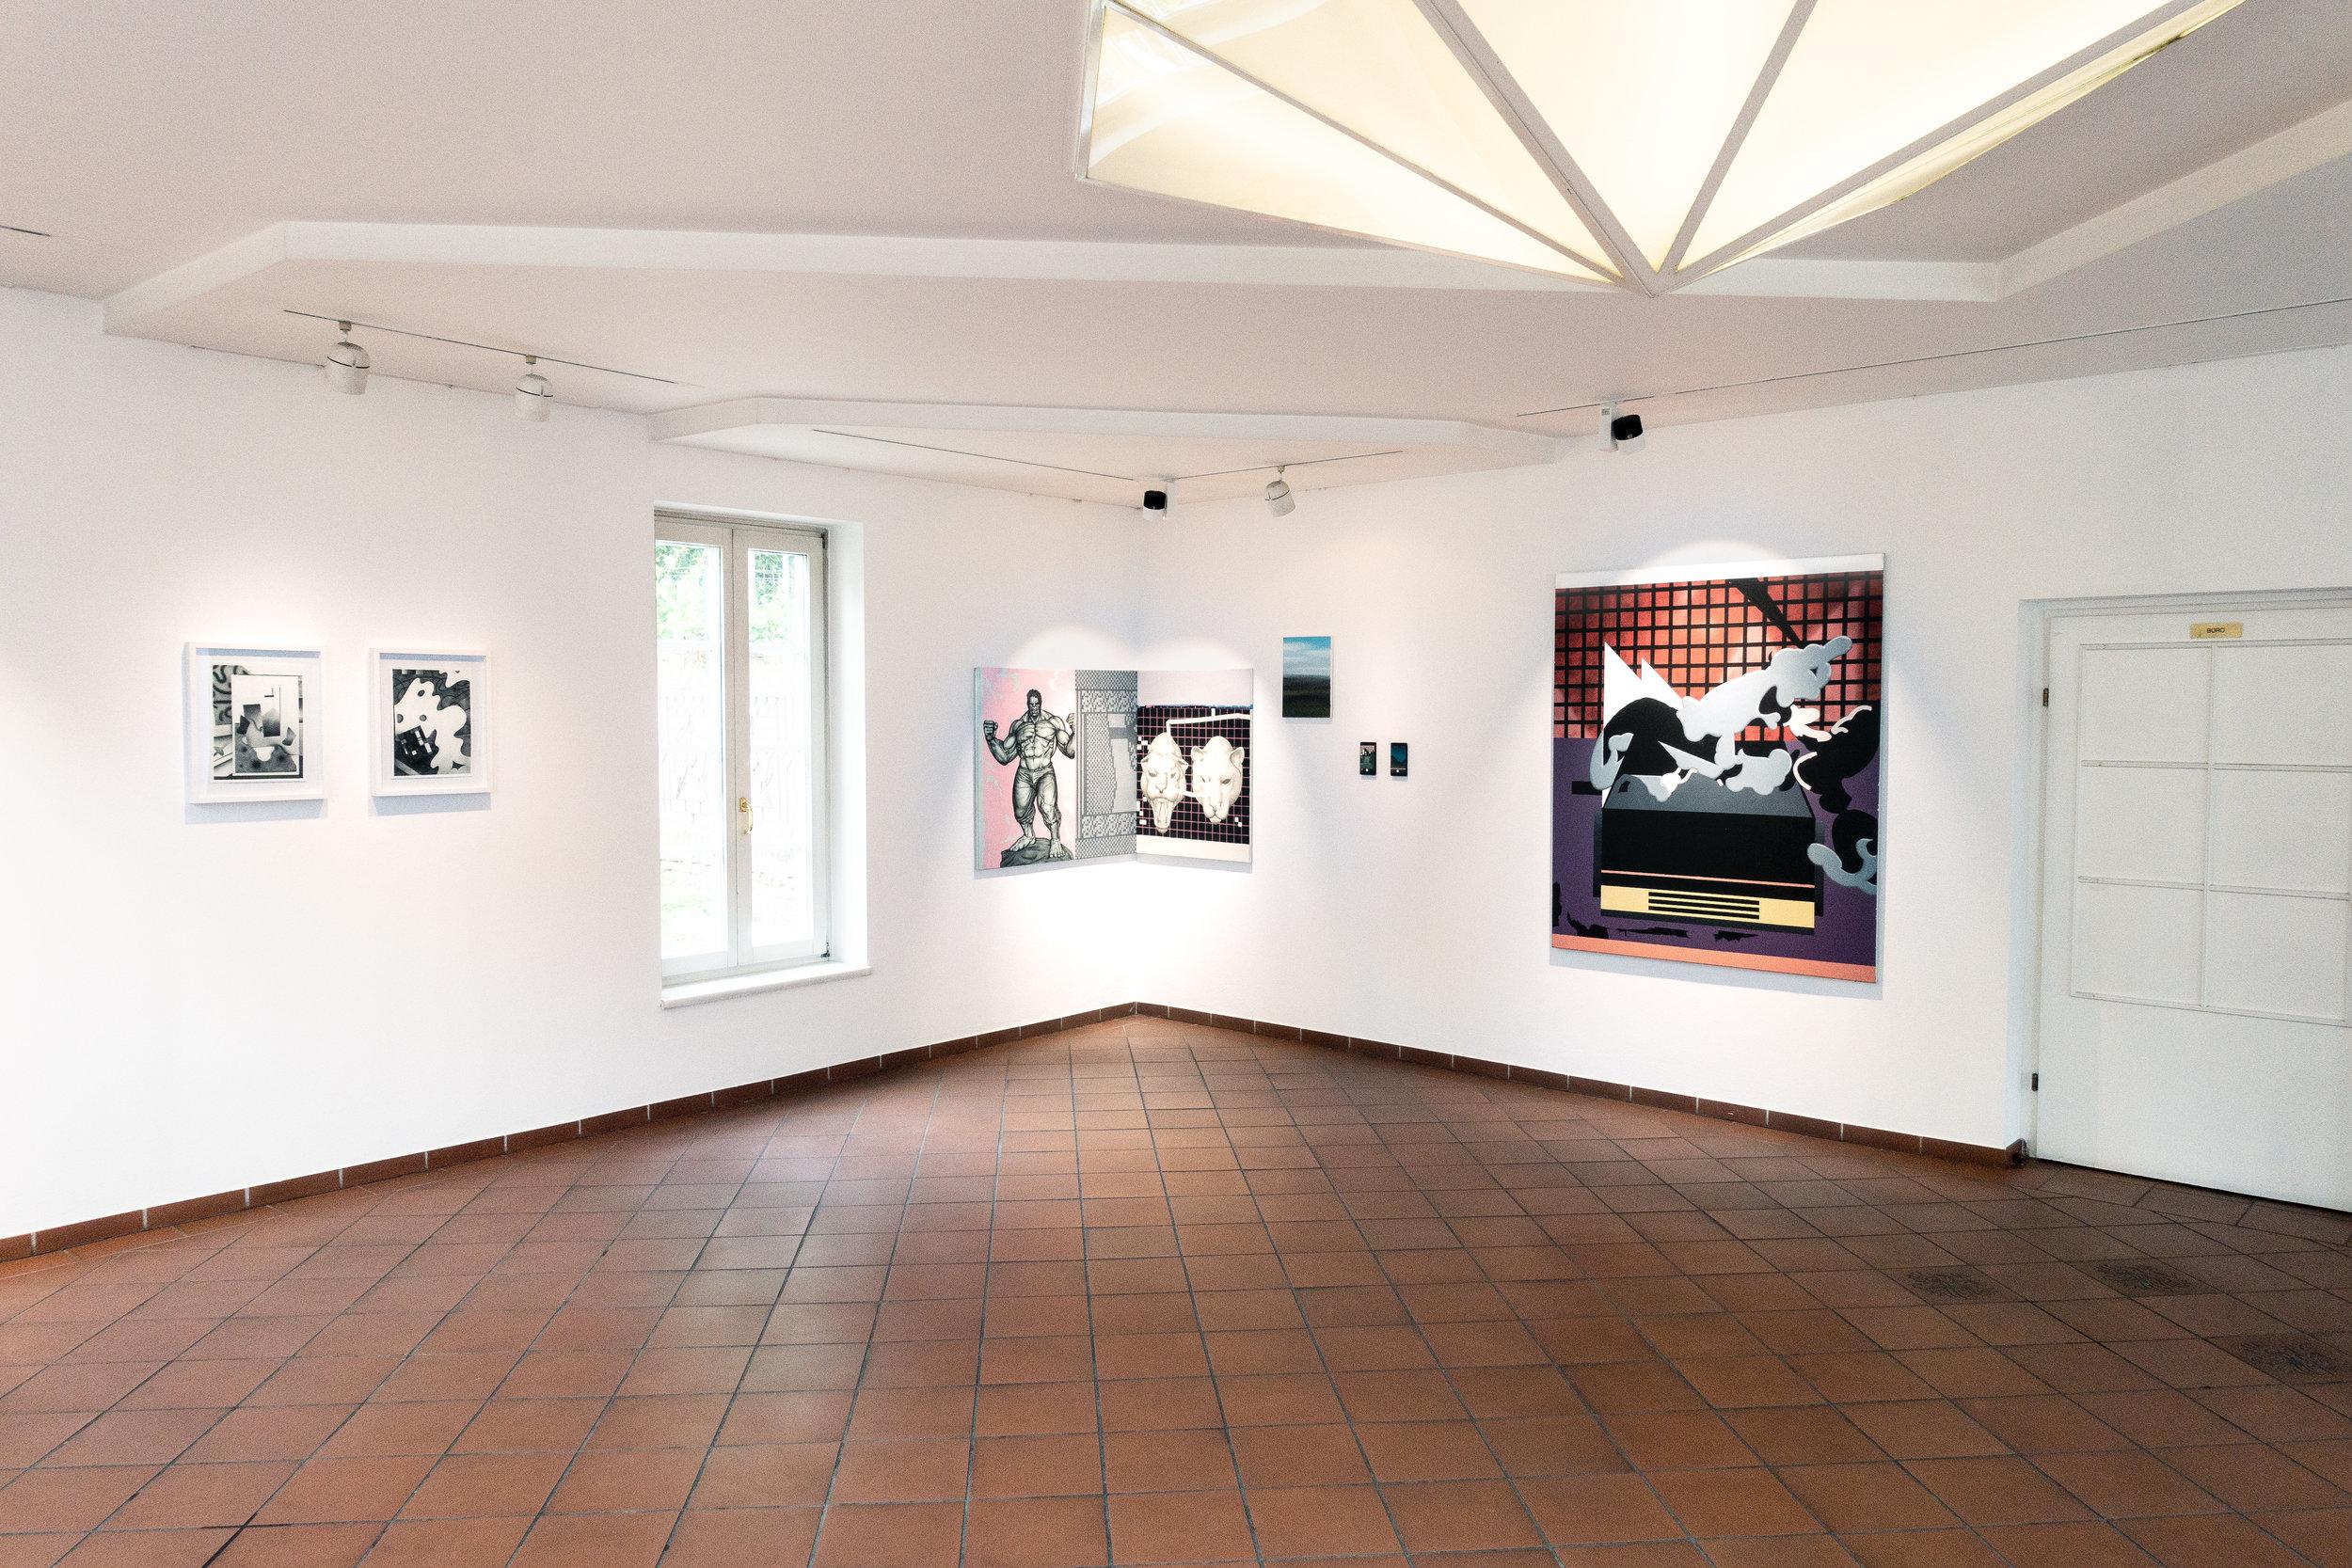 Instalationview-Schlumberger-ArtFloor-Paul-Riedmueller-2018-02.jpg